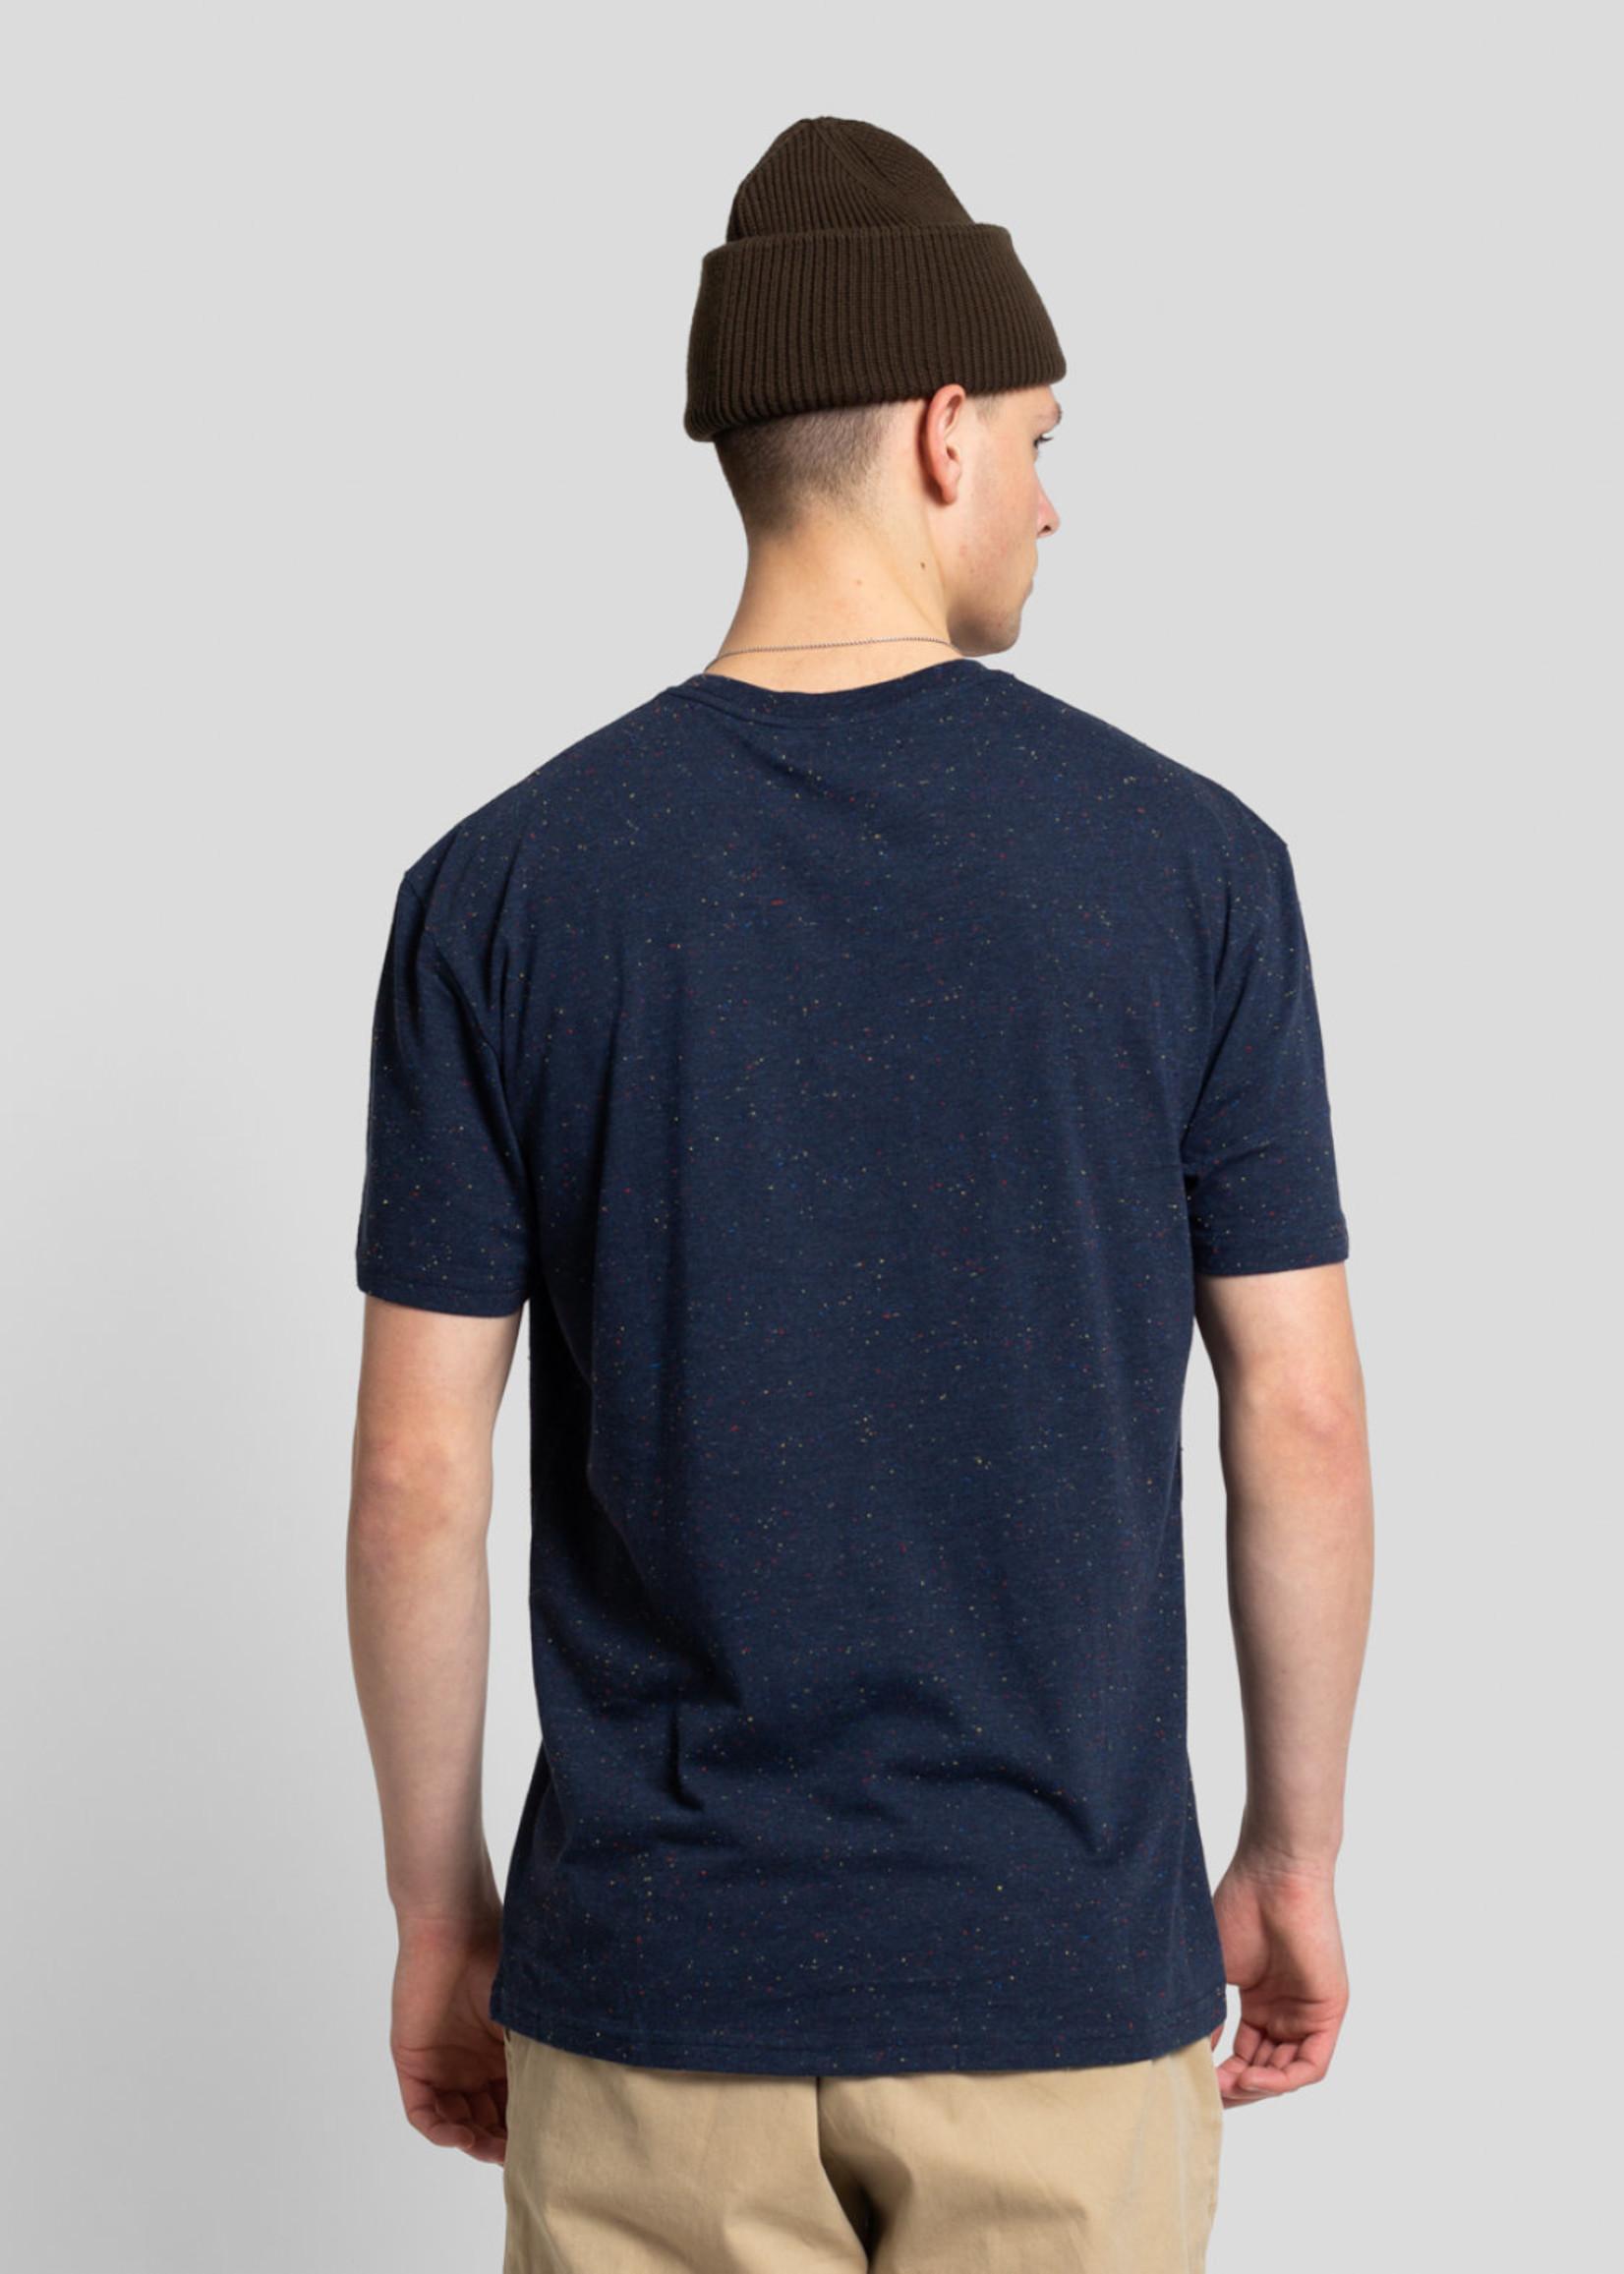 Revolution 1243 Loose T-Shirt